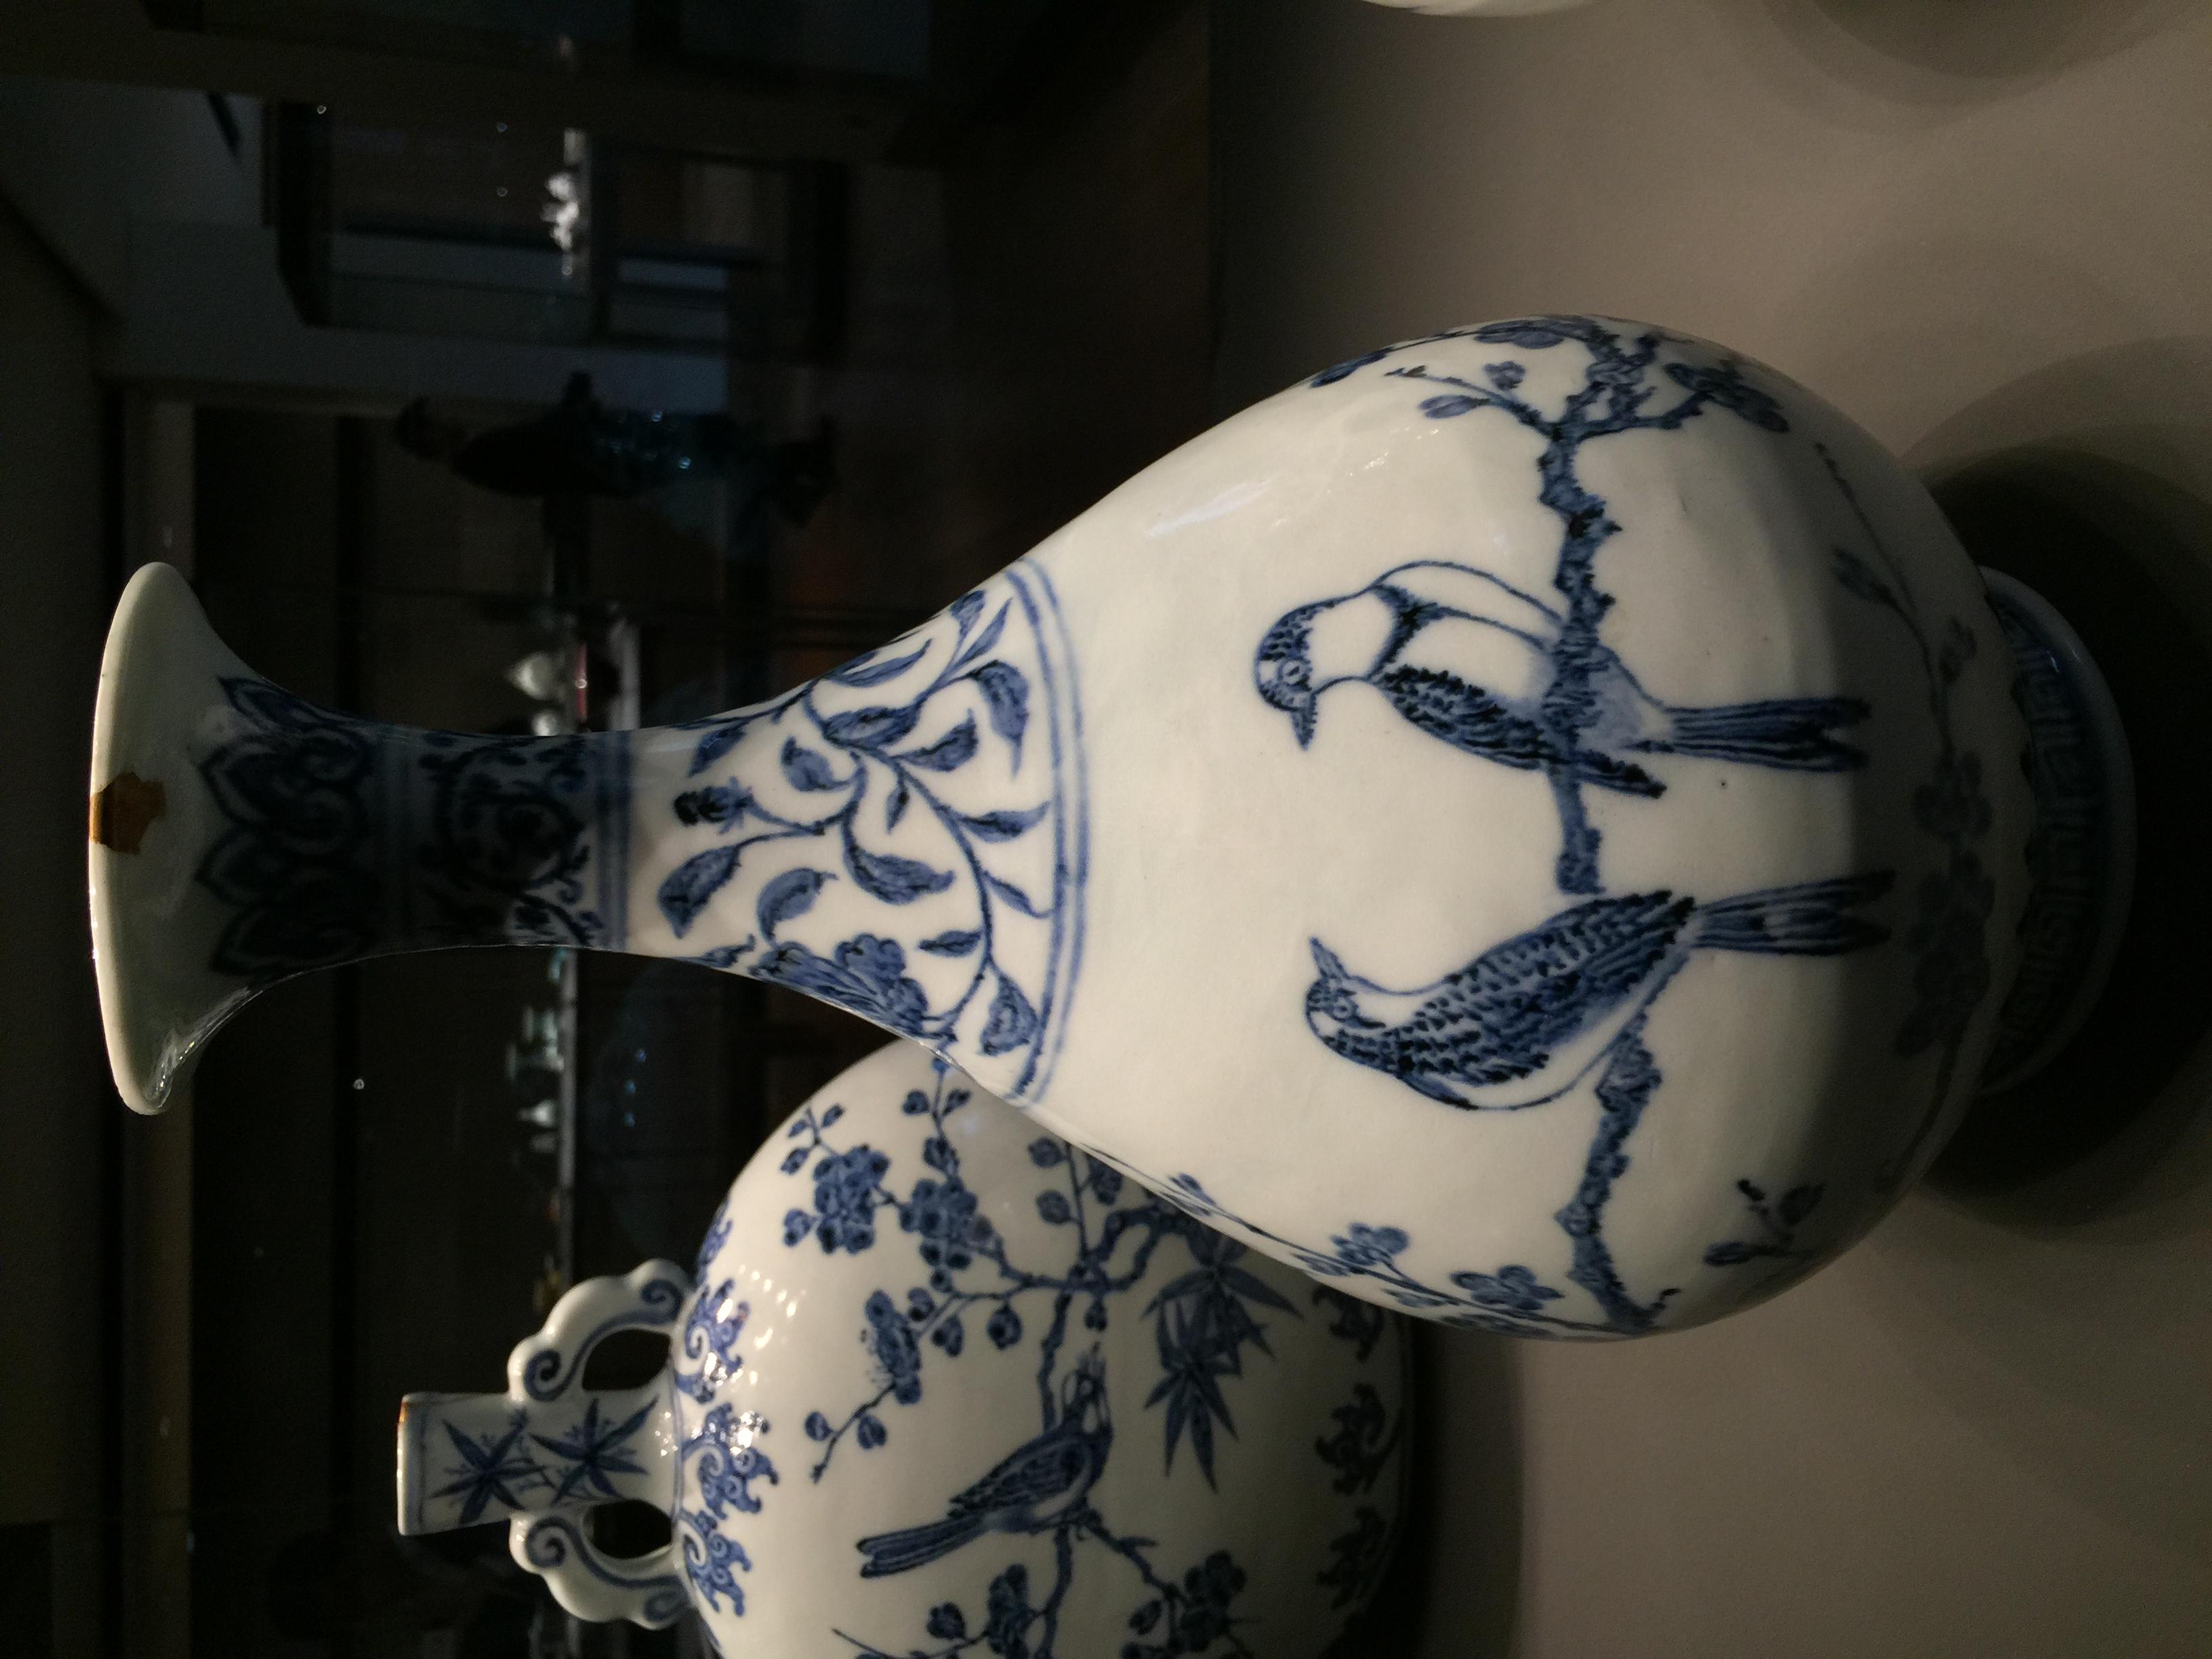 Chinese-Porcelain-British-Museum-Percival-David-jessewaugh.com-41.jpg